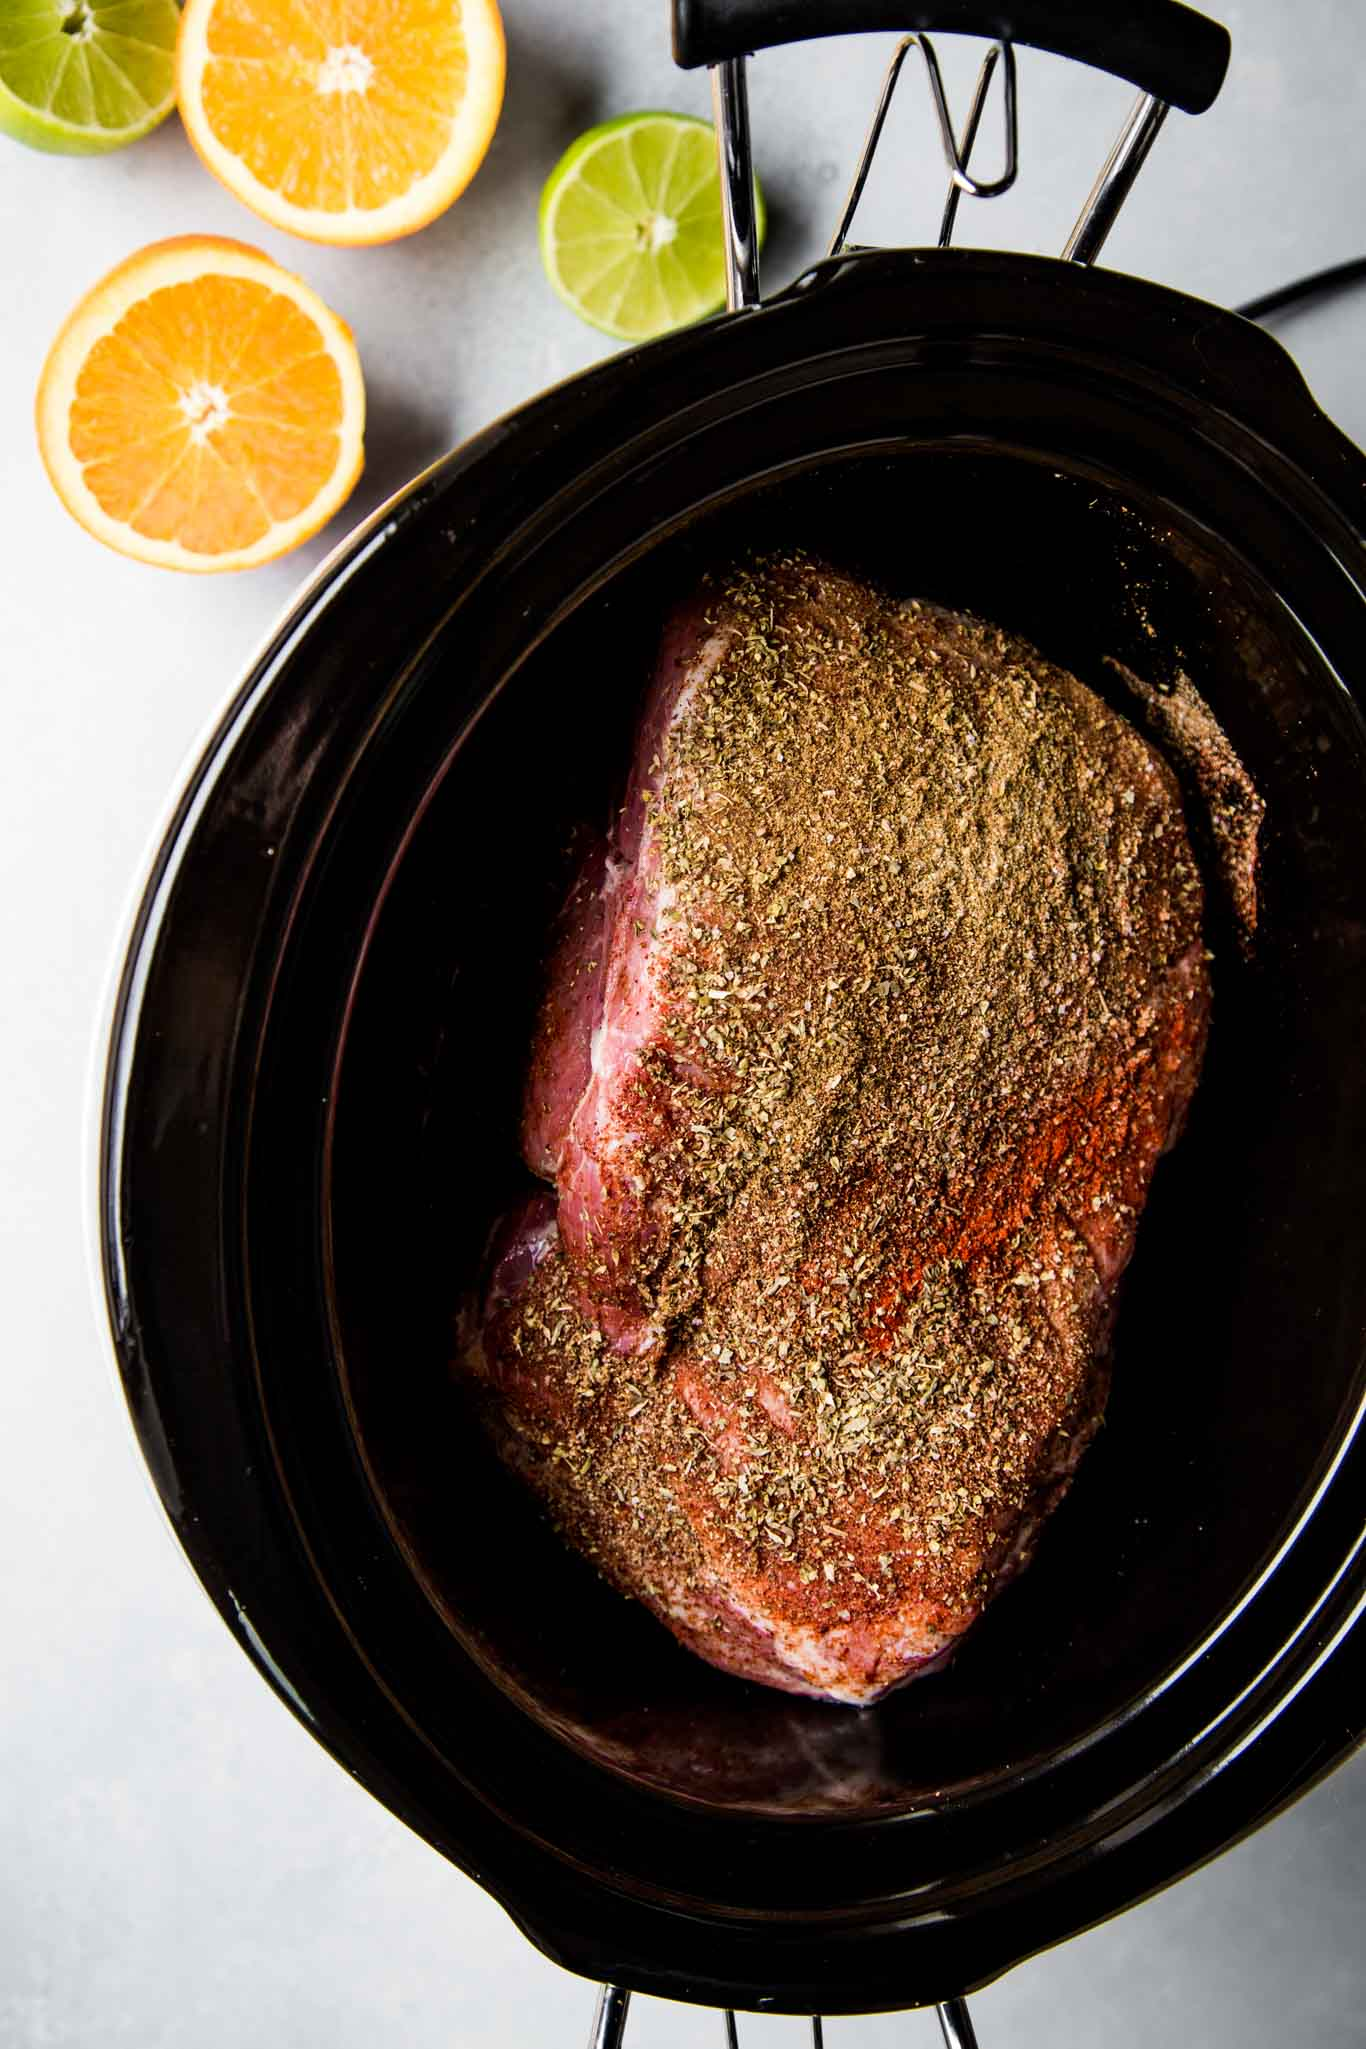 Pork in slow cooker.